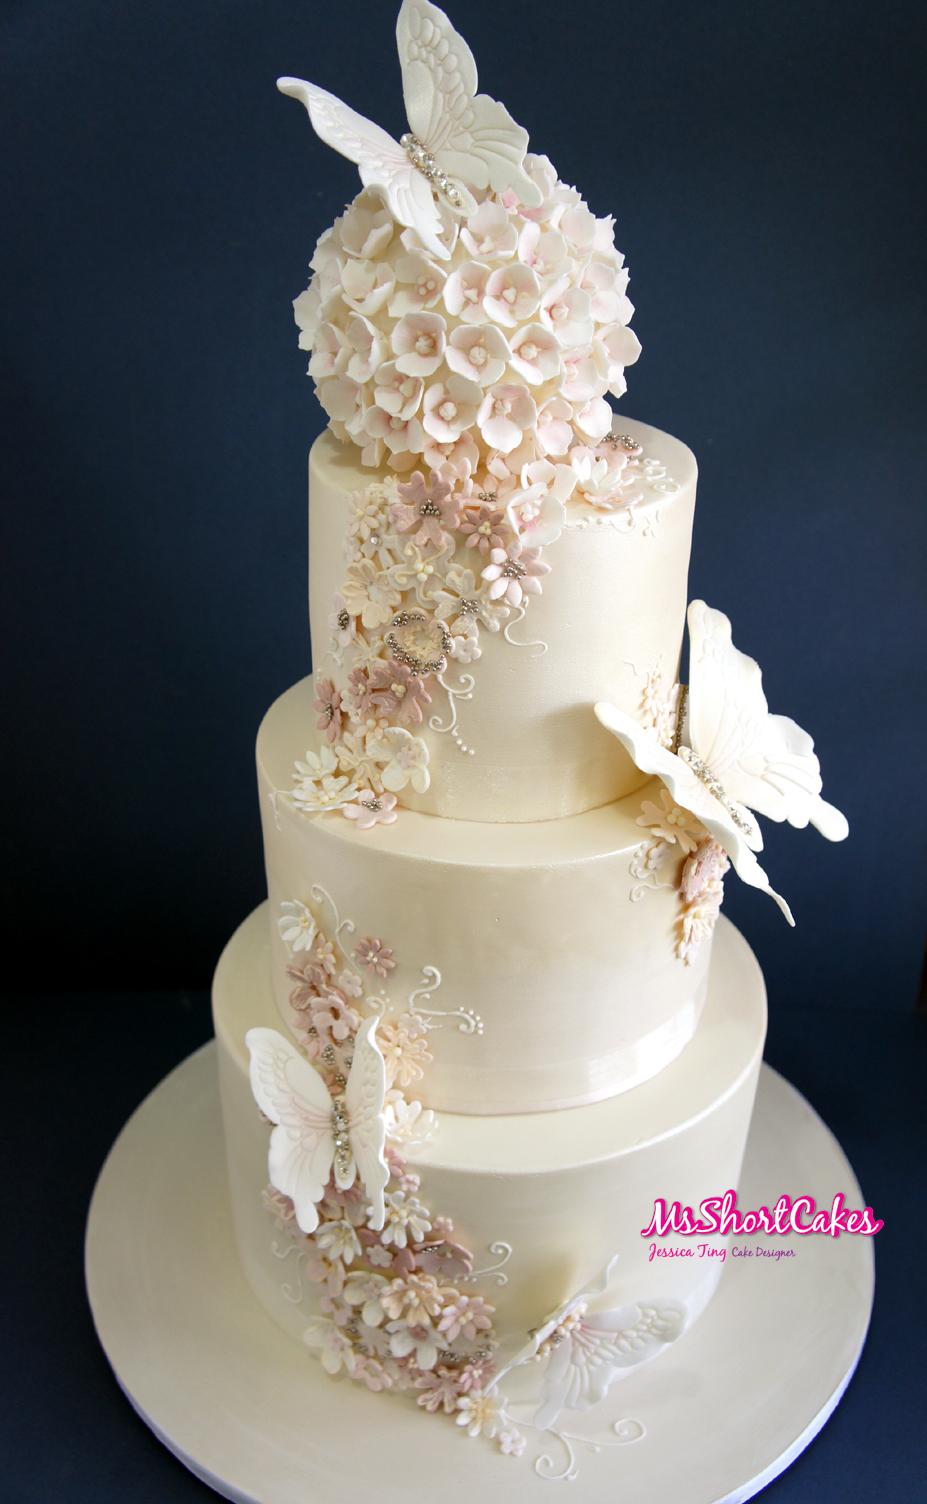 Jessica-Ting-Wedding-Elegant-6.jpg#asset:15619